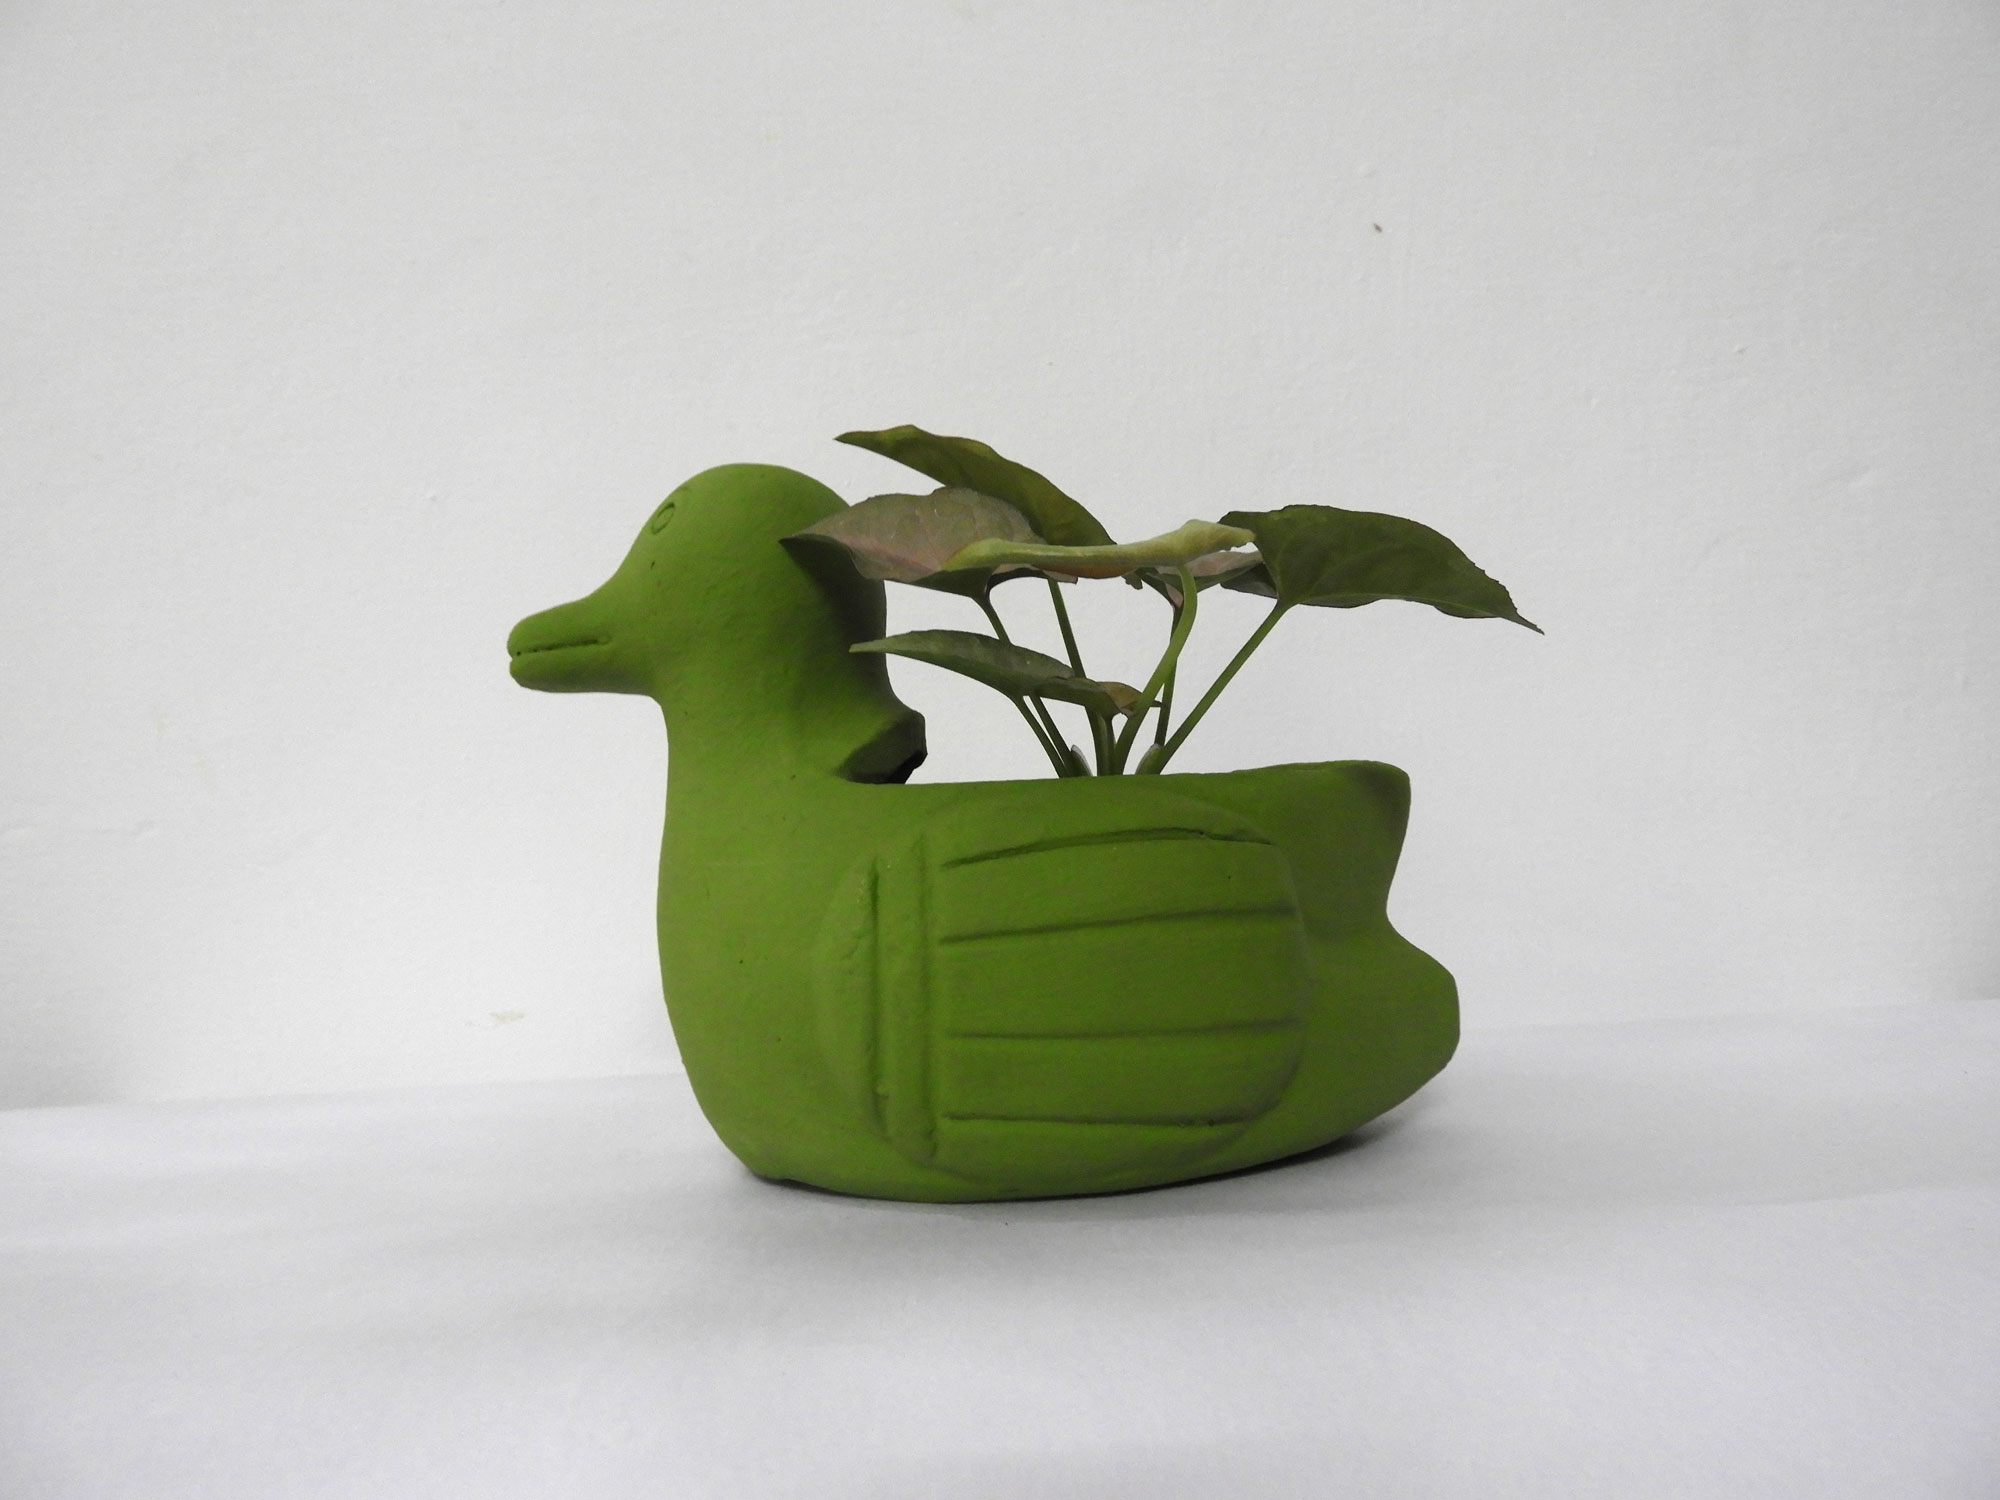 Pot Duck (S) - gardening pots for sale in yelahanka new town bangalore